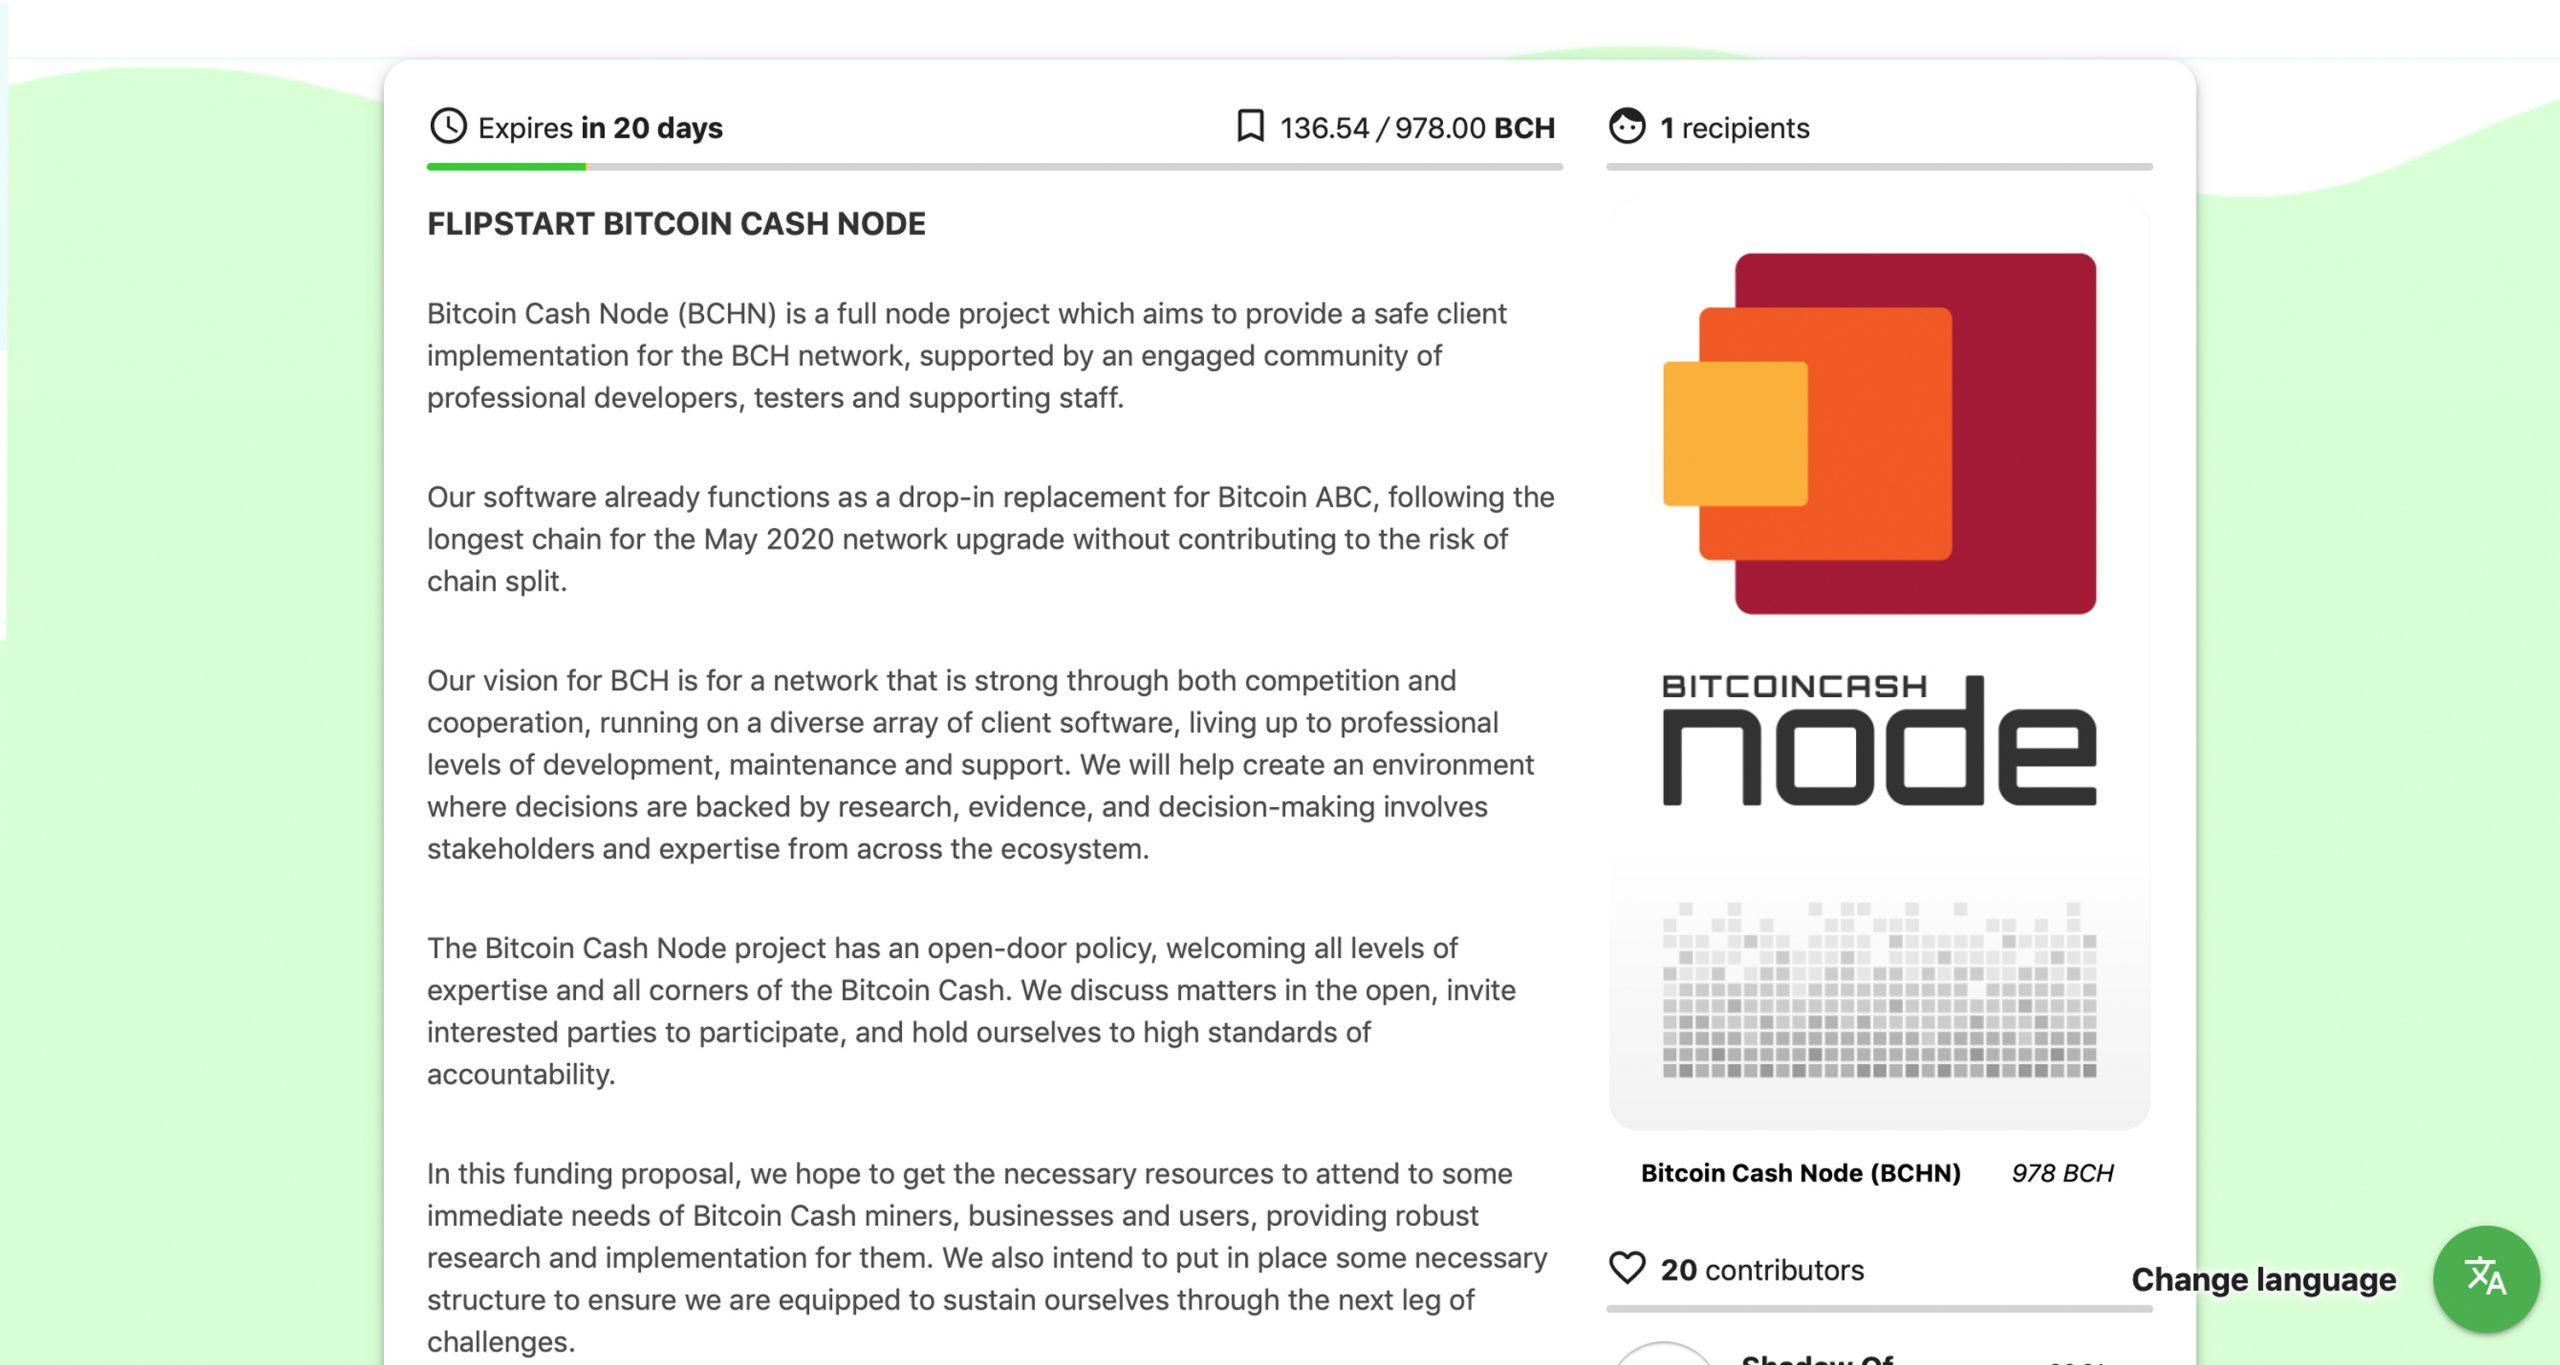 5 Bitcoin Cash Full Node Teams to Raise Funds With the Noncustodial Flipstarter App